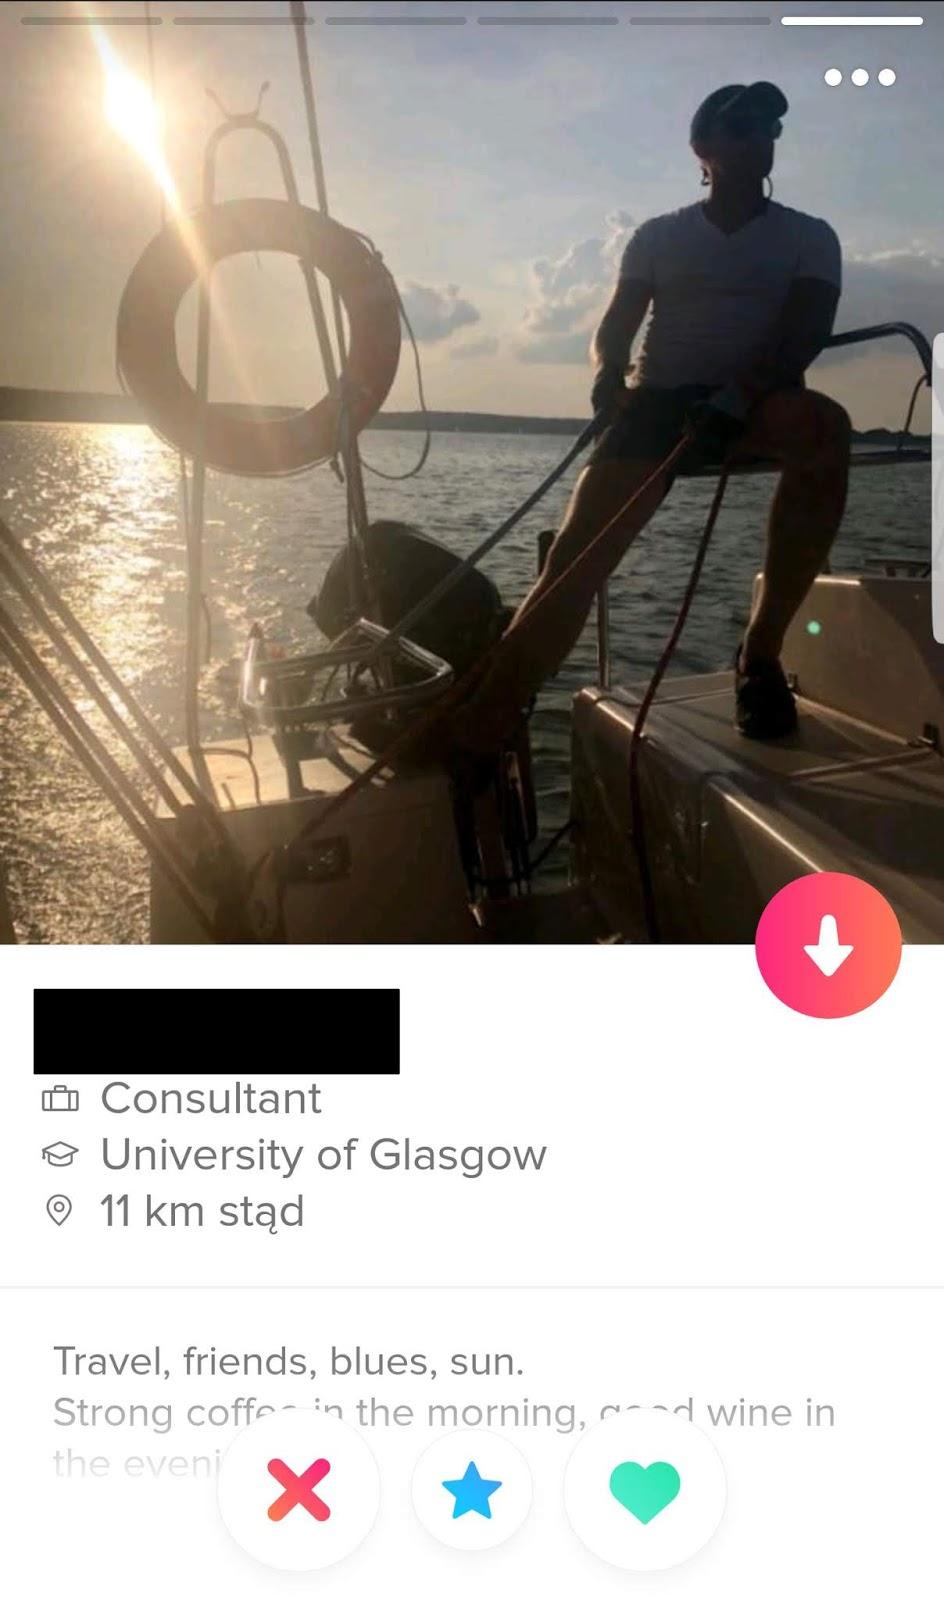 aplikacja randkowa Norge